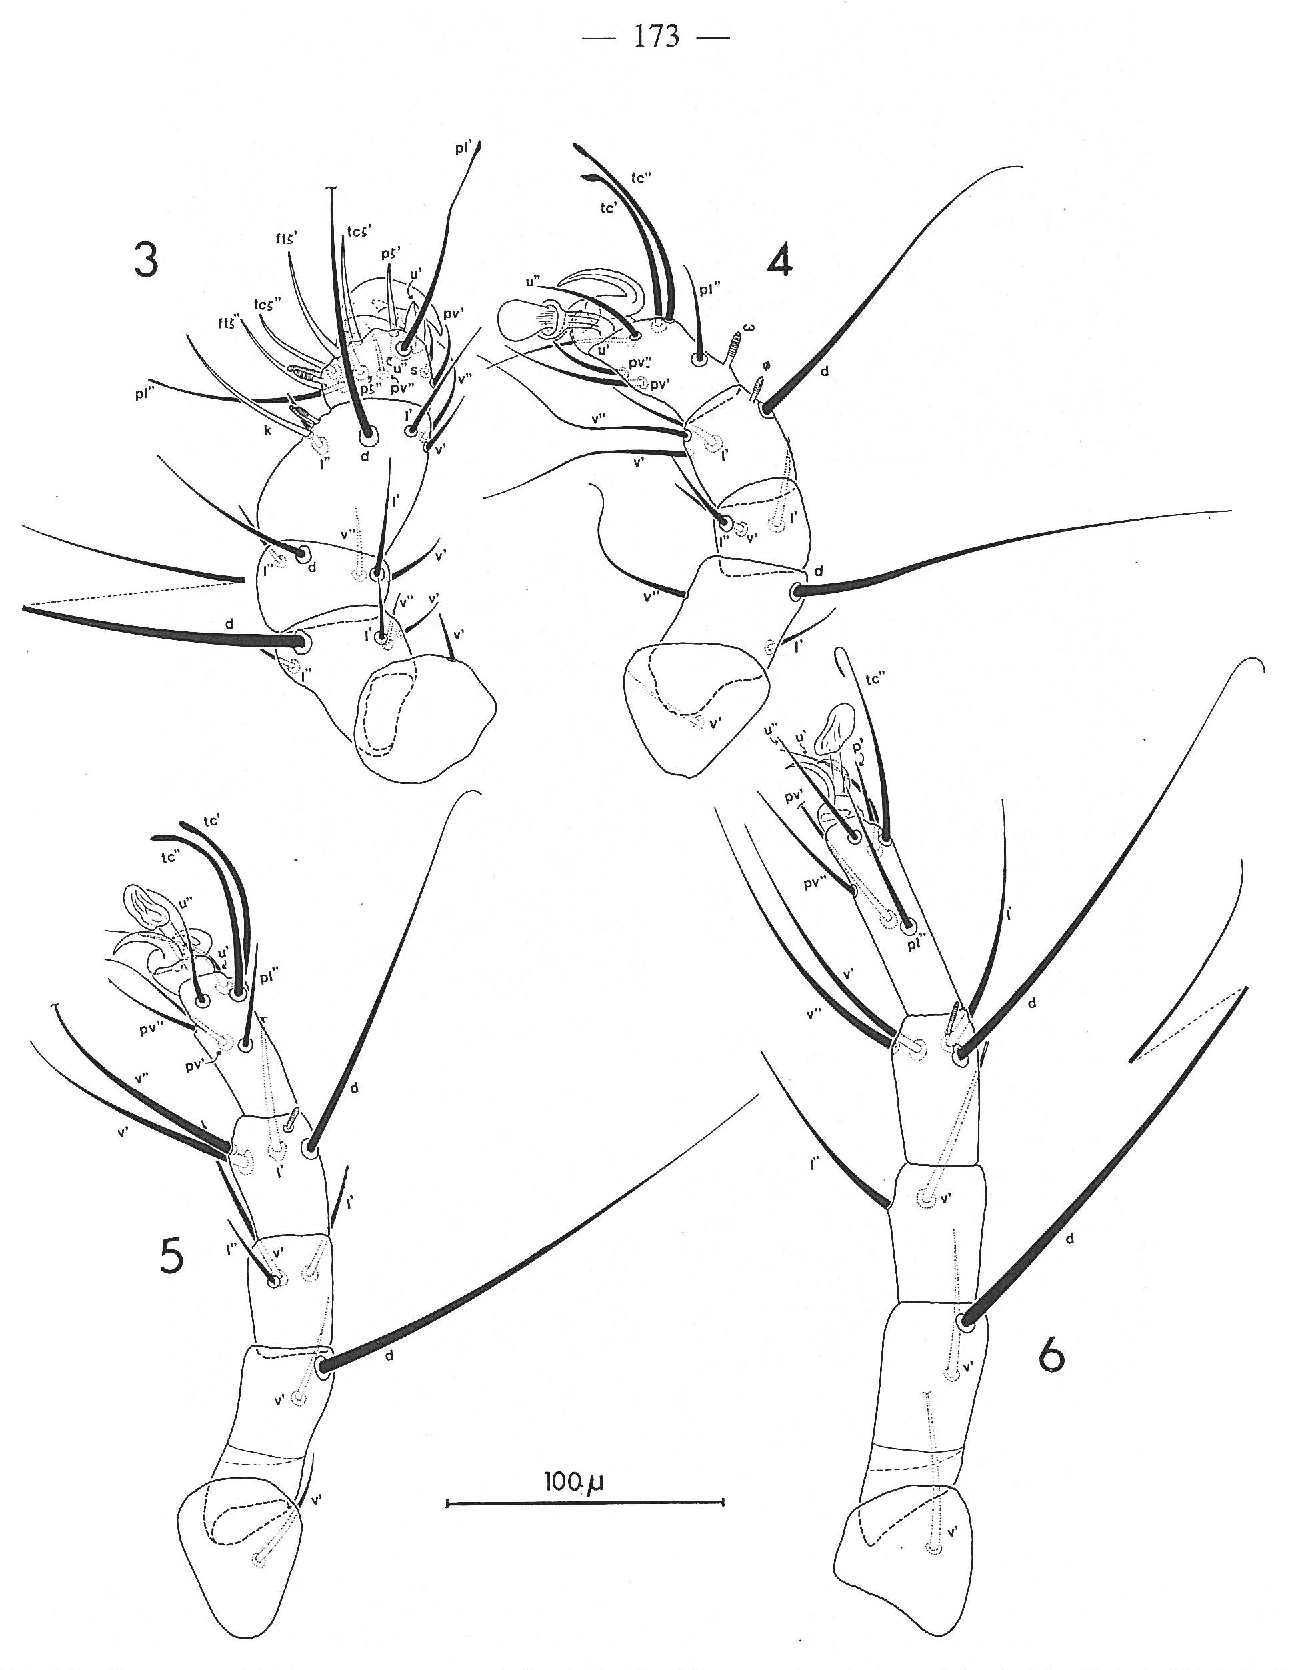 figure 3-6